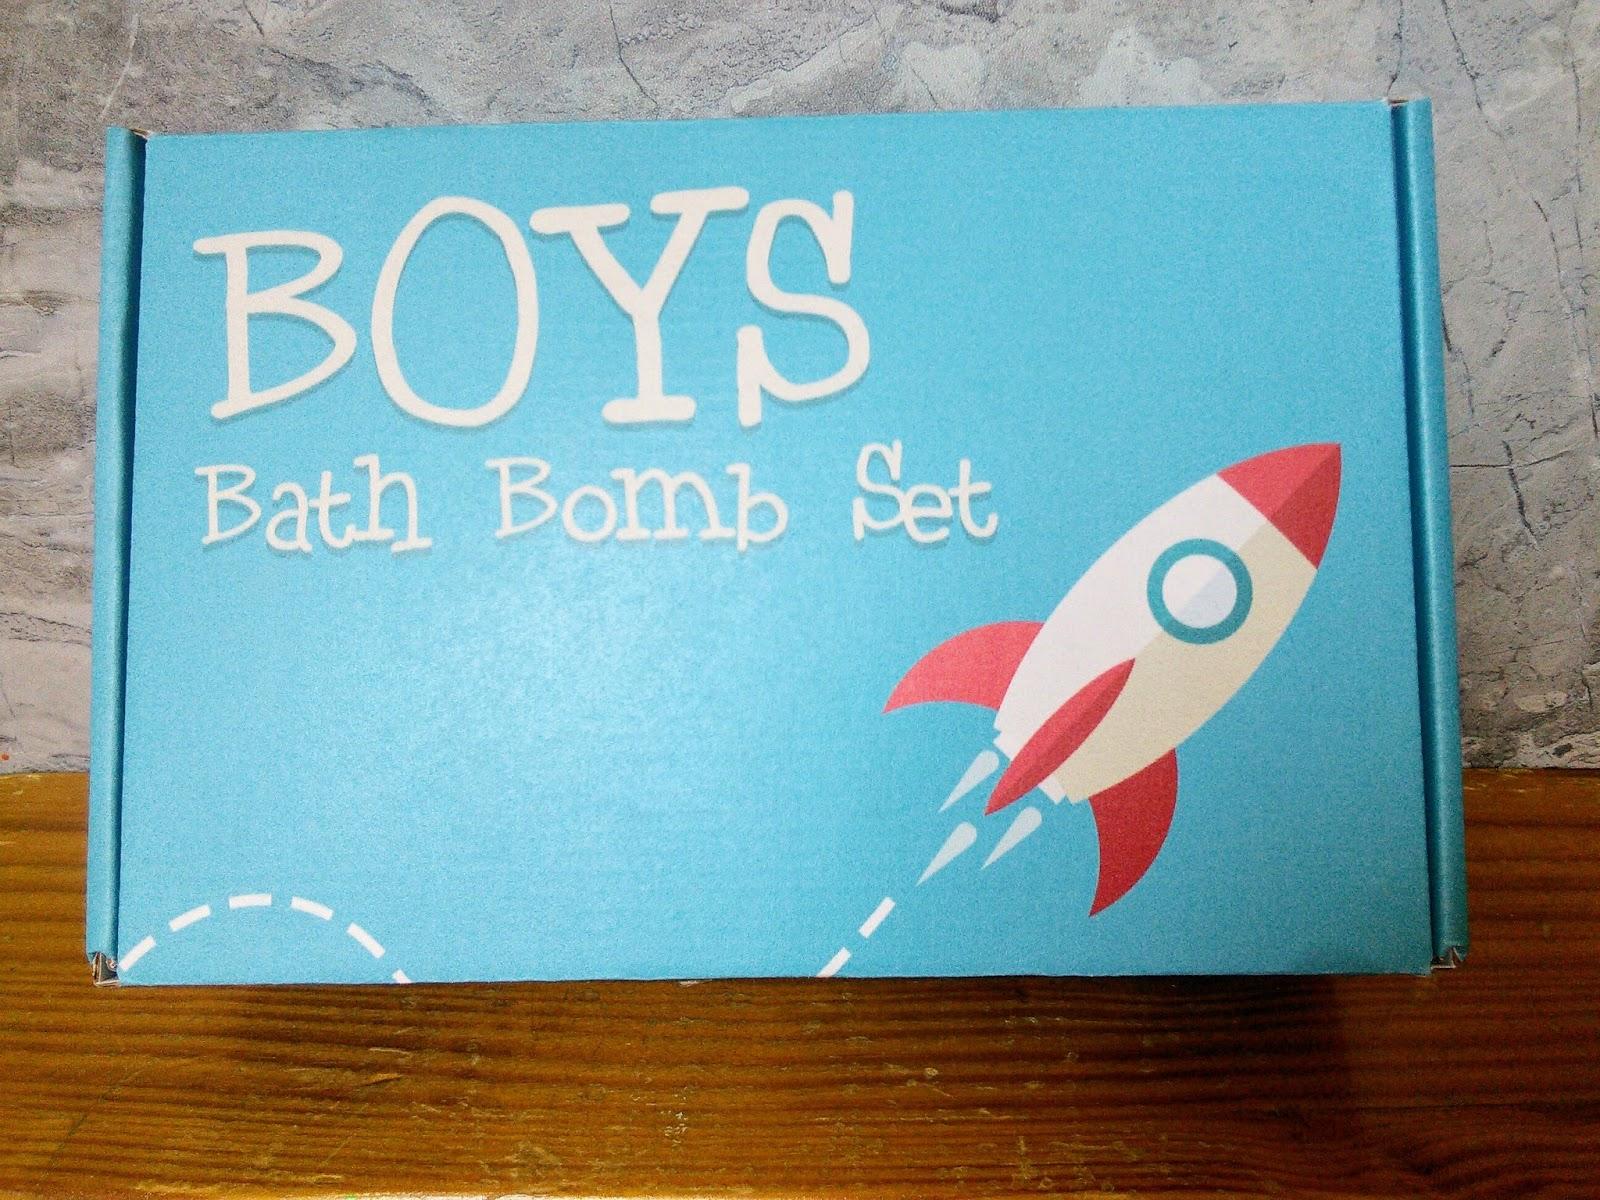 Mom Knows Best : Fun In The Tub With Boys Bath Bomb Set